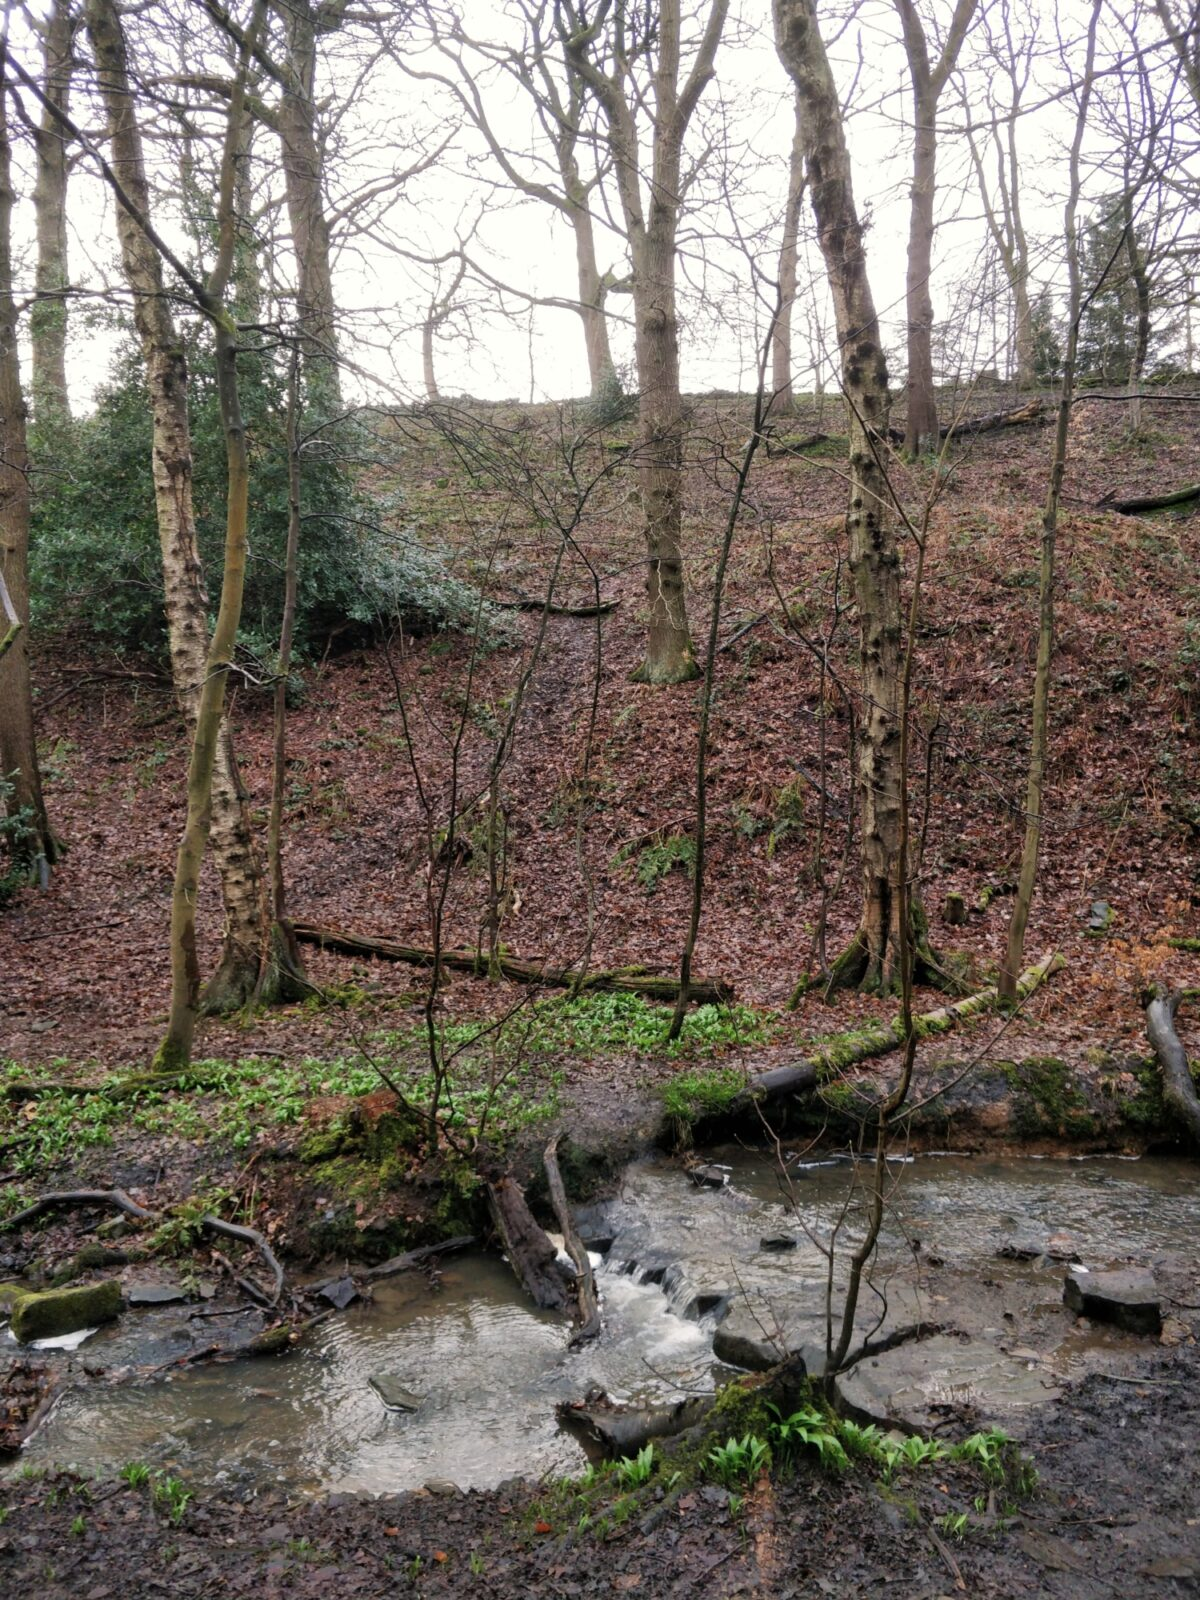 Northcliffe Woods, Shipley large photo 1